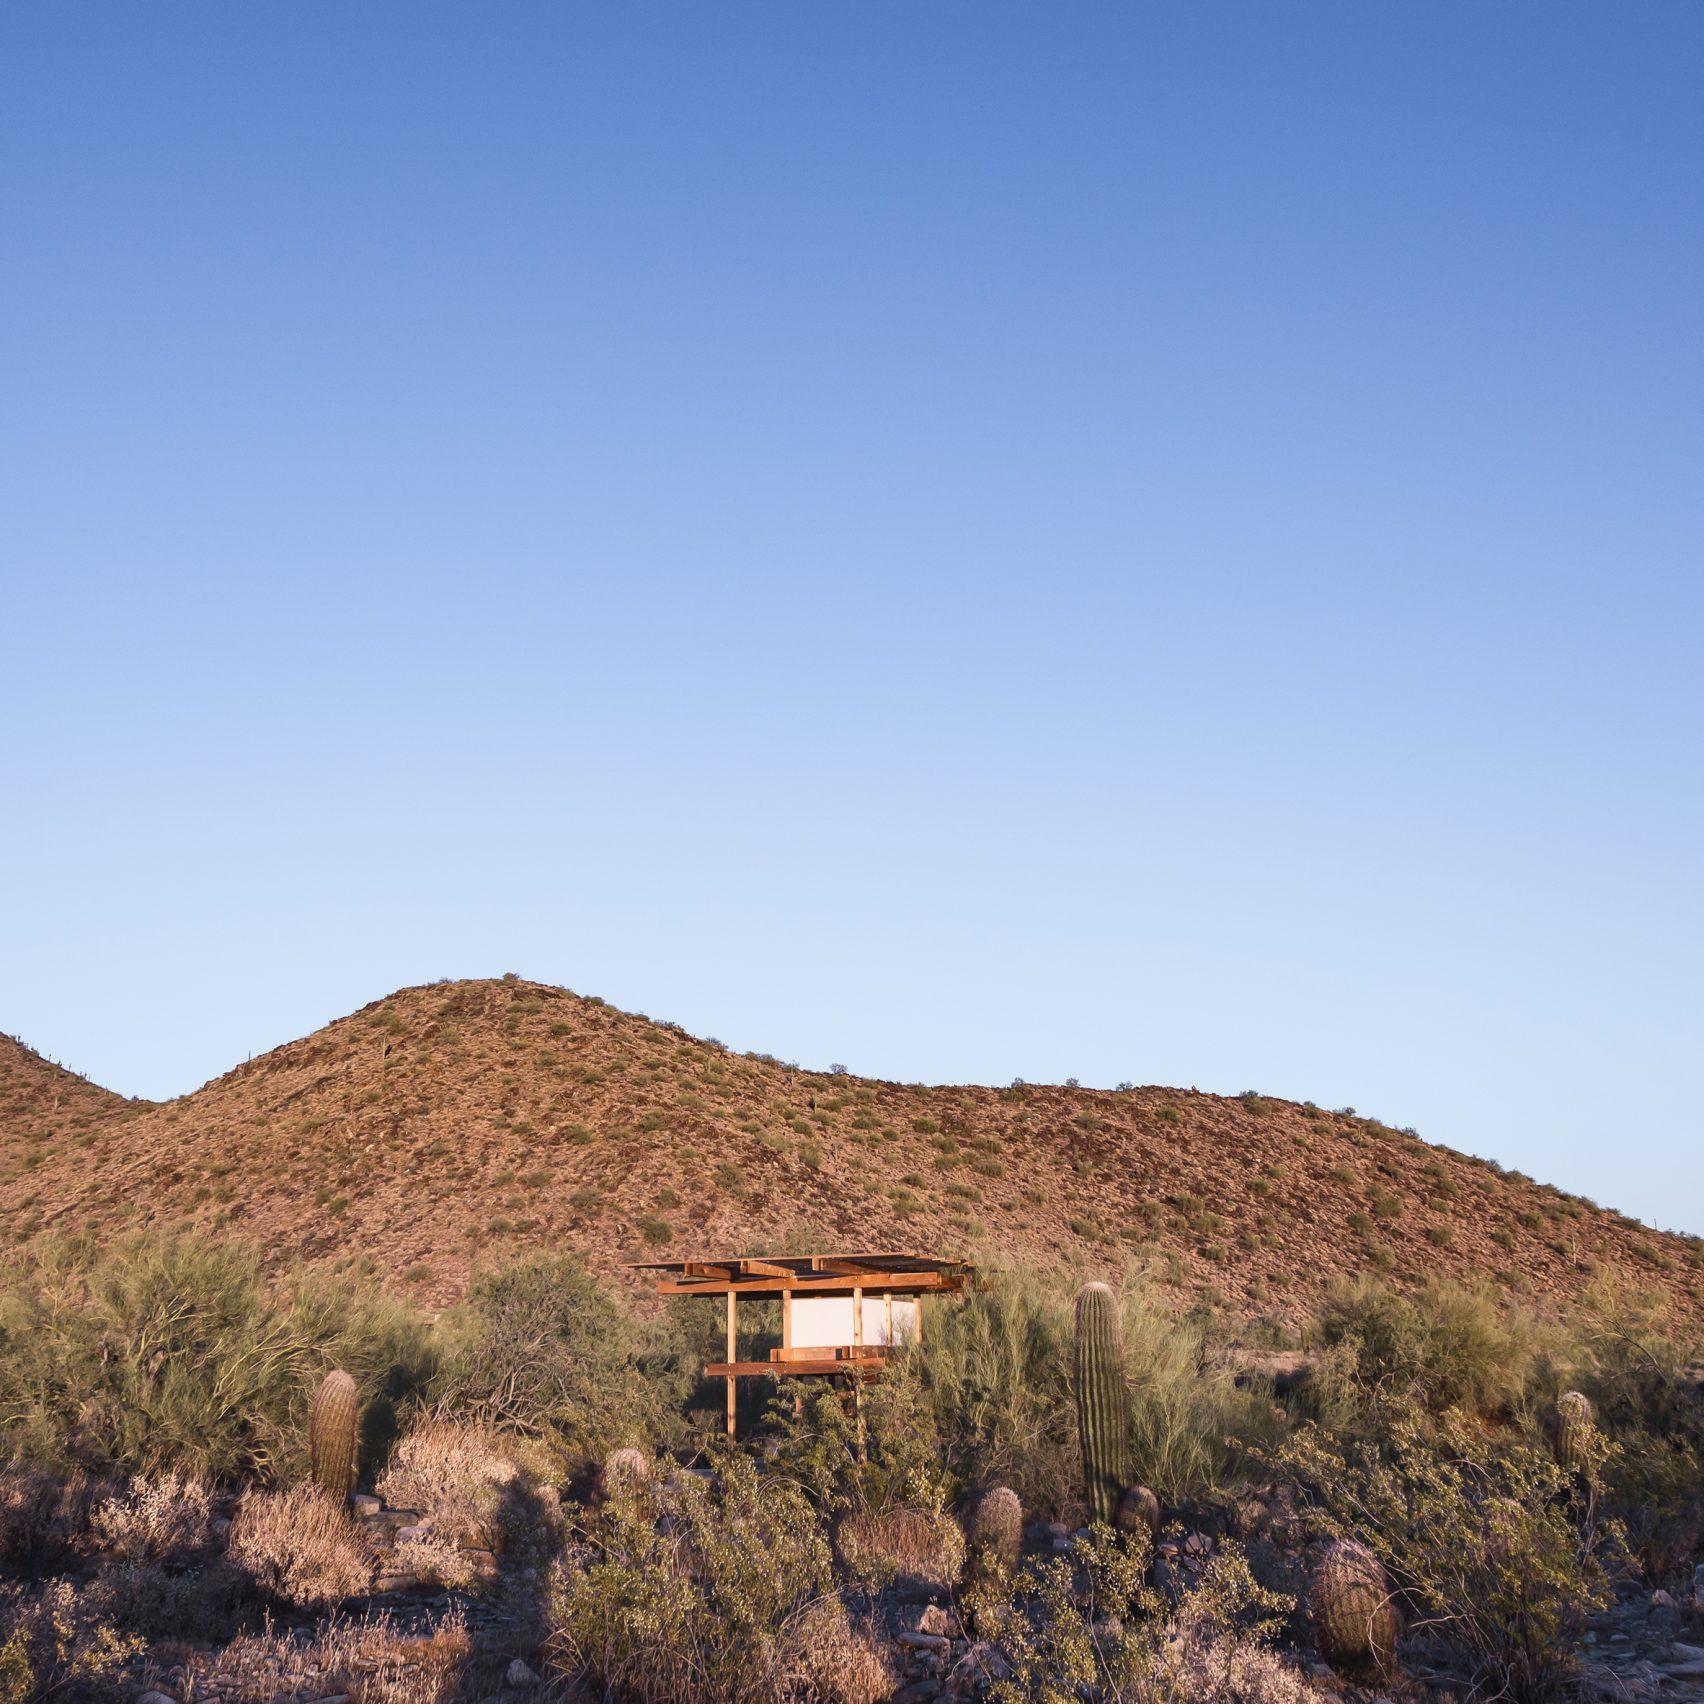 Atalaya Shelter by Jaime Inostroza